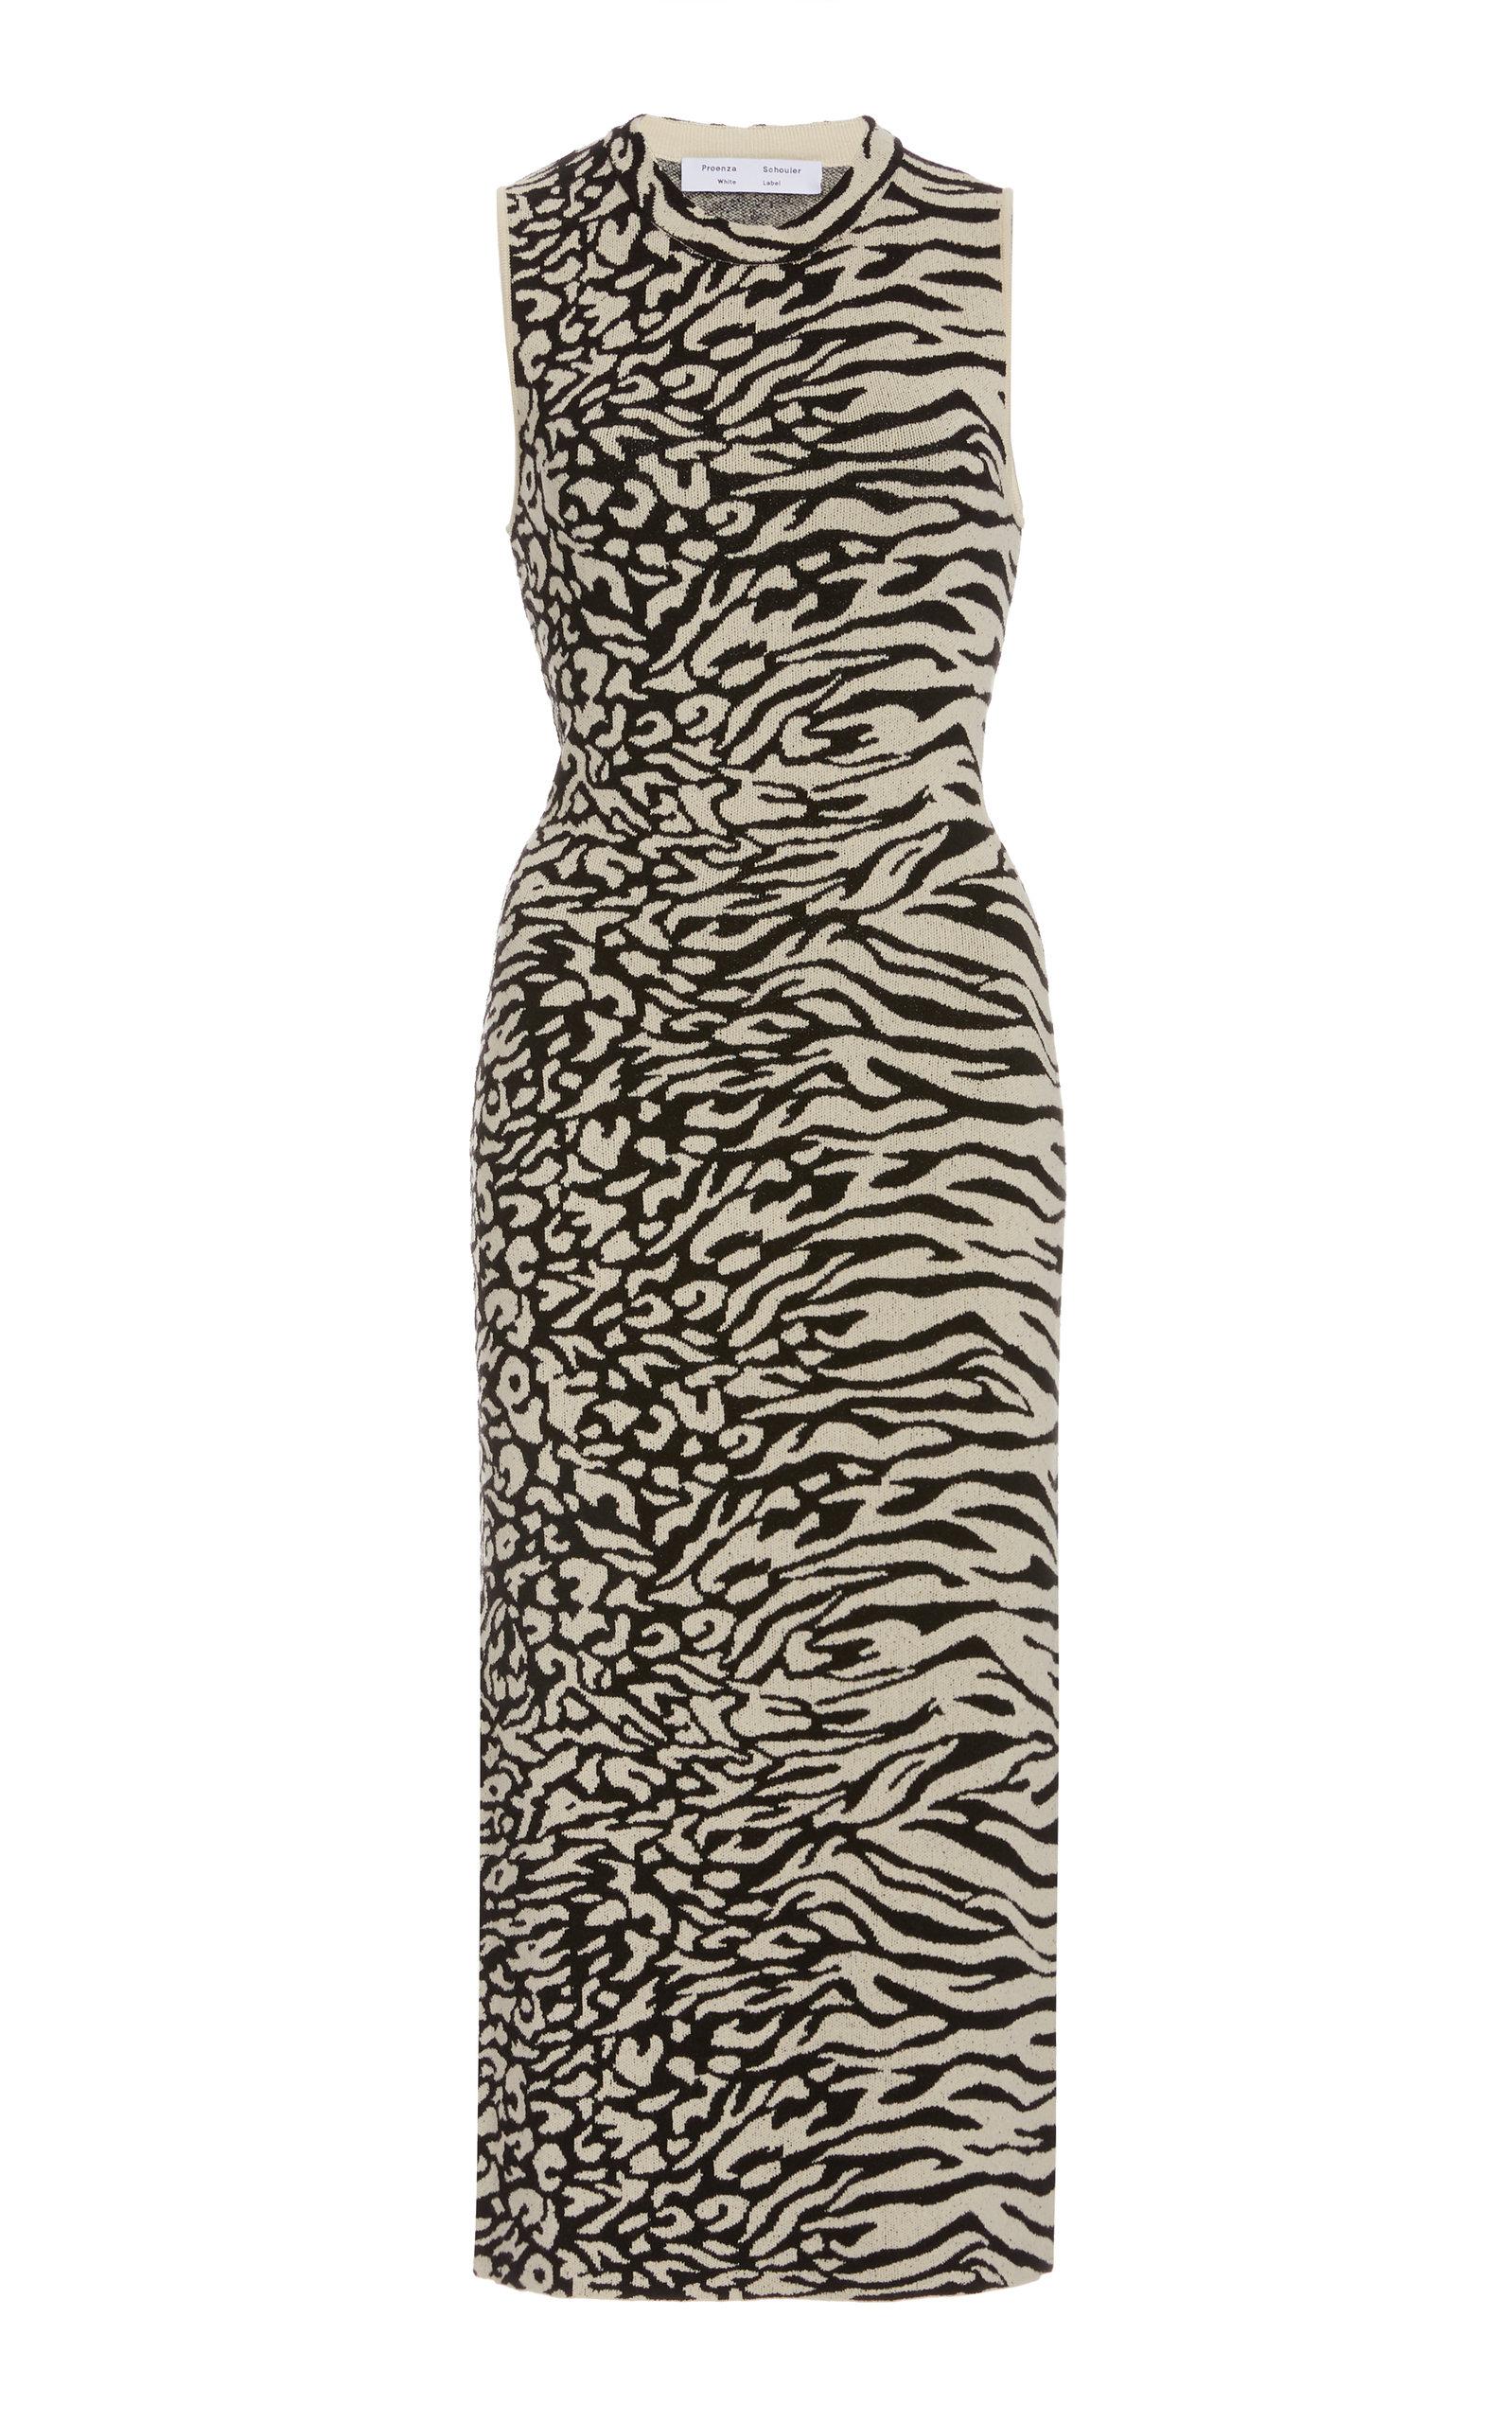 Buy Proenza Schouler White Label Zebra-Print Knit Dress online, shop Proenza Schouler White Label at the best price